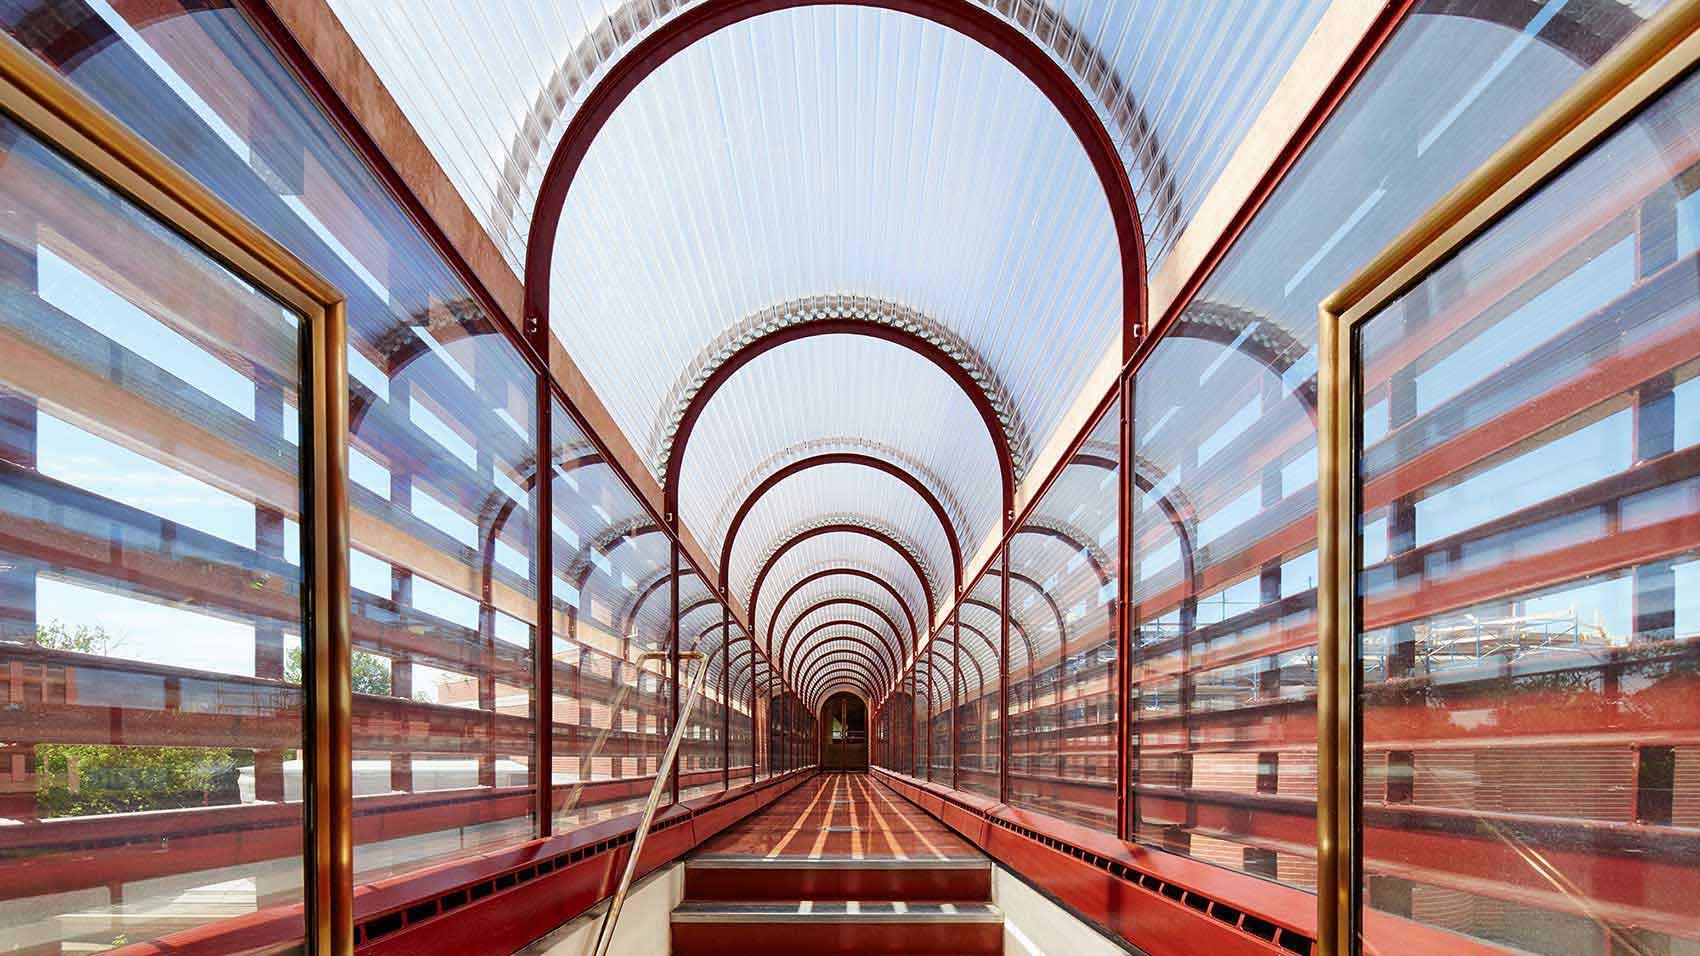 Frank Lloyd Wright designed catwalk on SC Johnson global headquarters campus